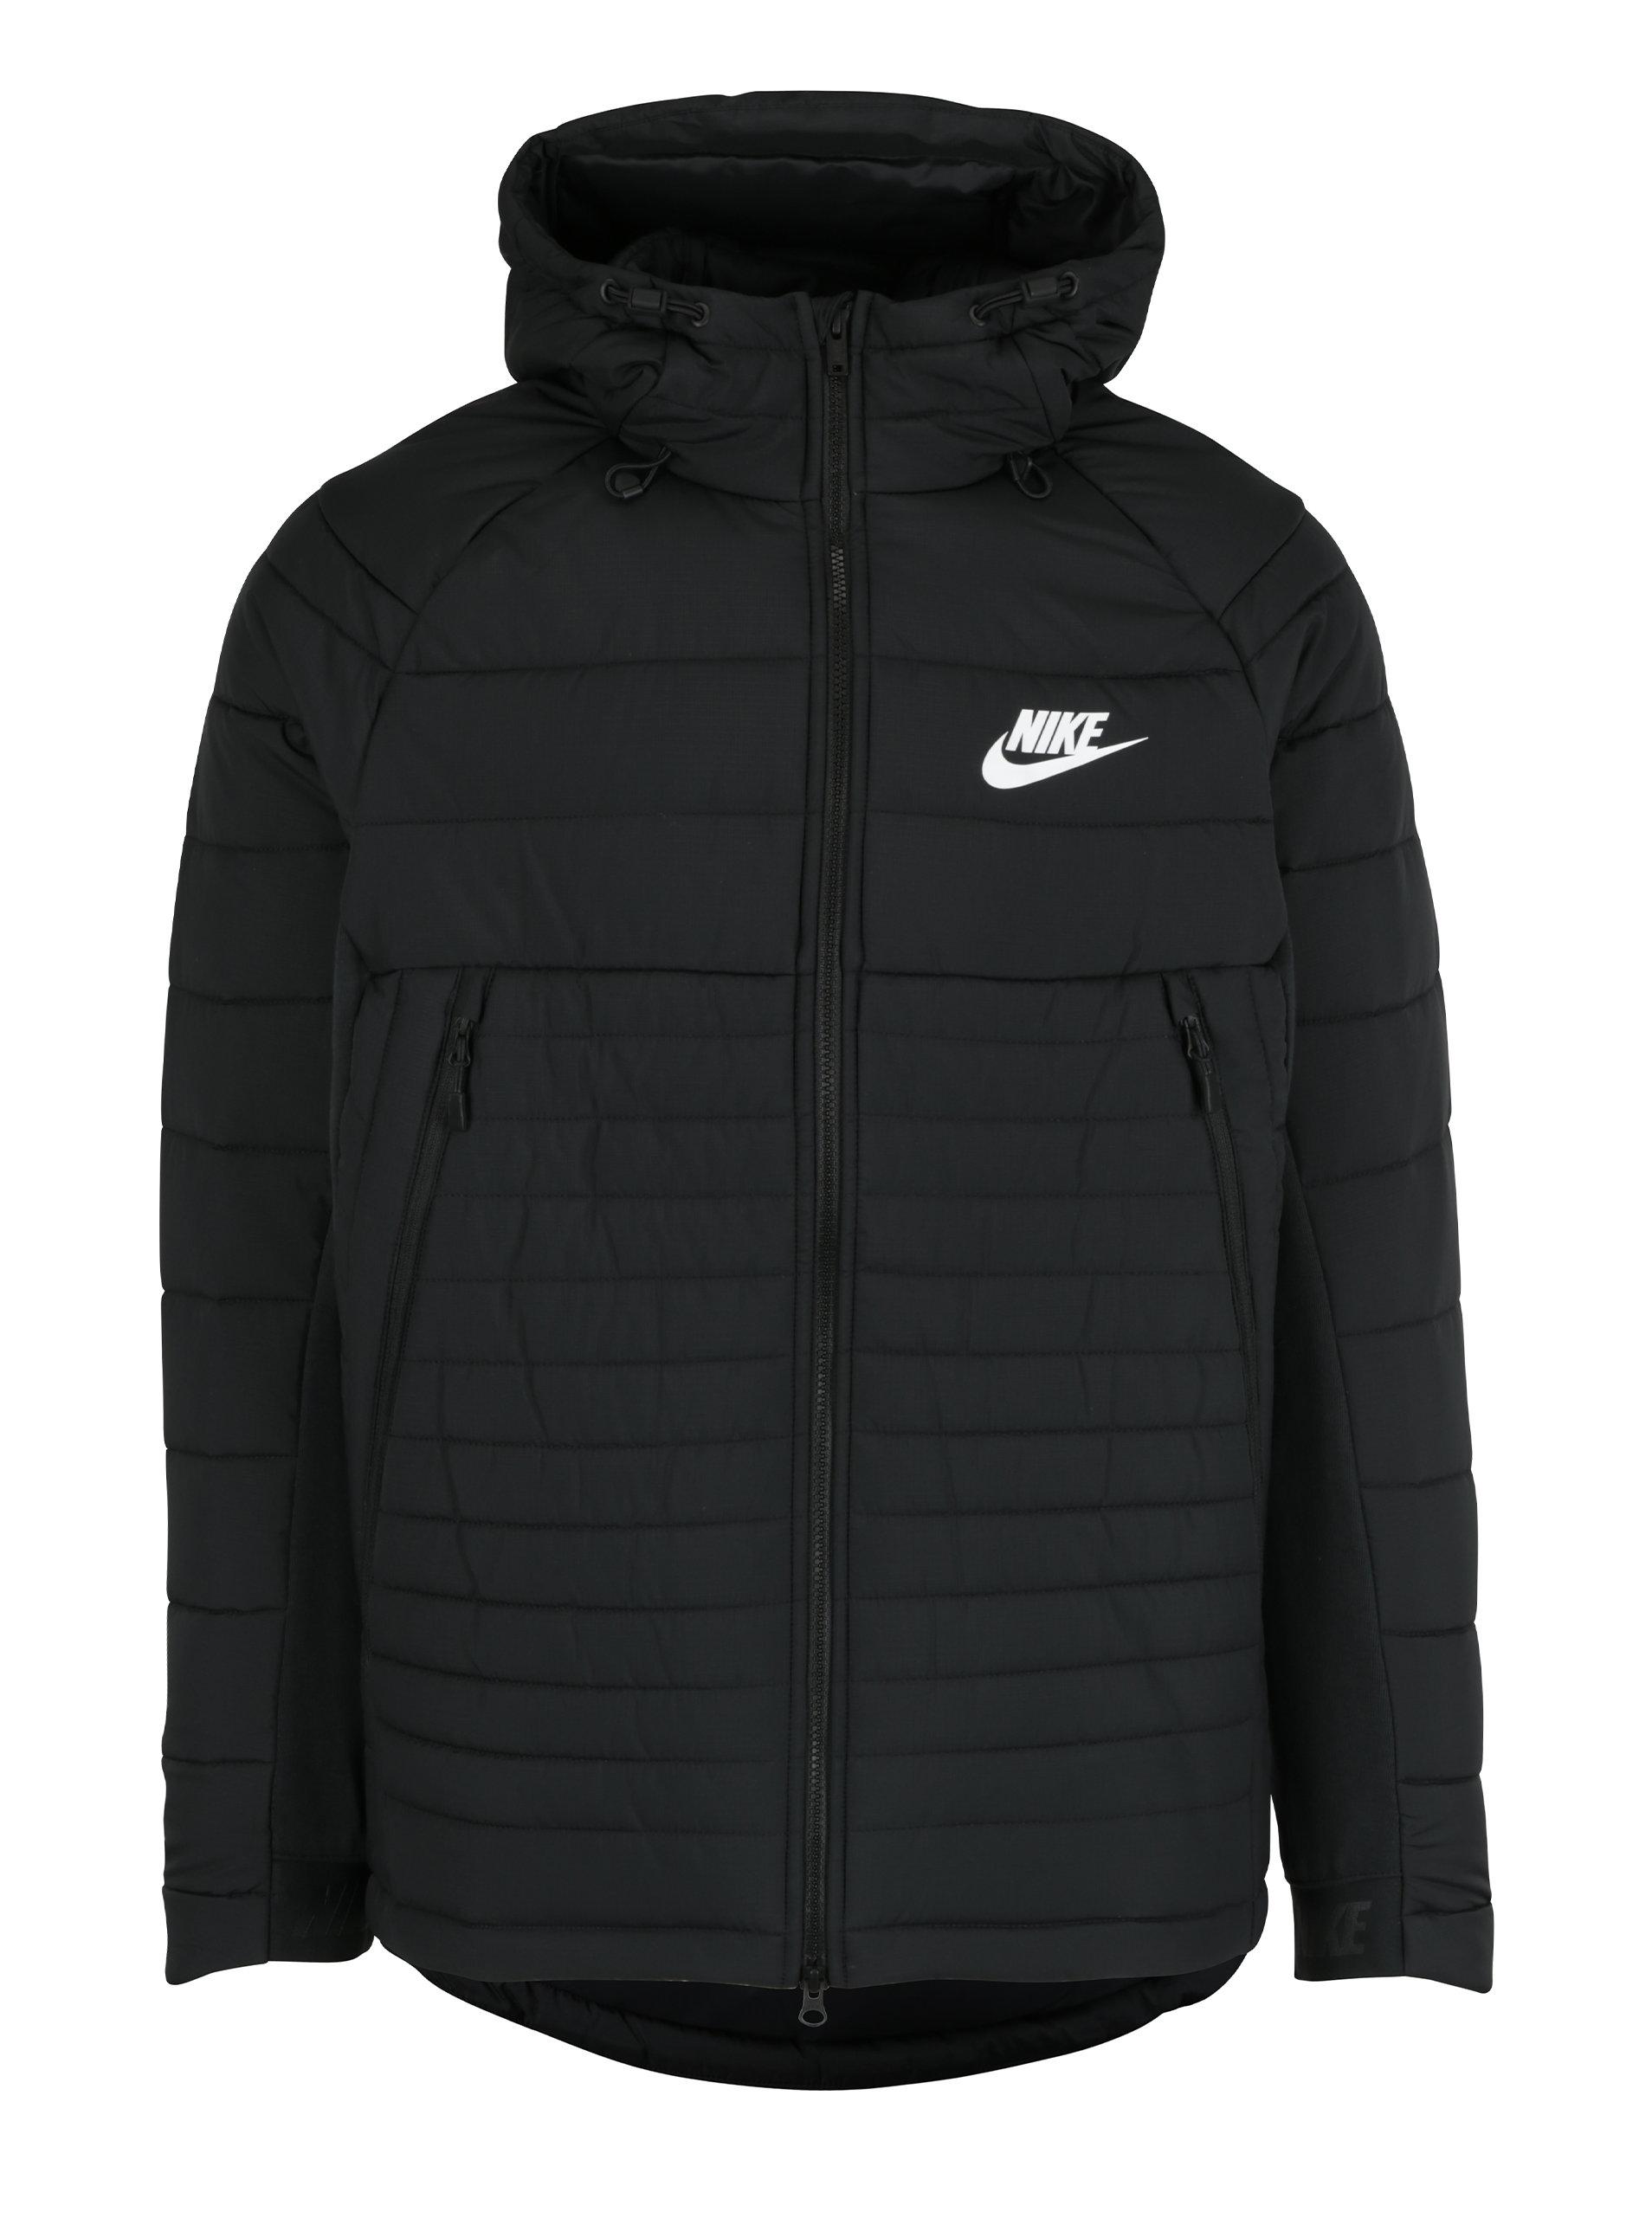 Čierna pánska zimná prešívaná bunda s kapucňou Nike Sportswear Fill ... 1c253f39547